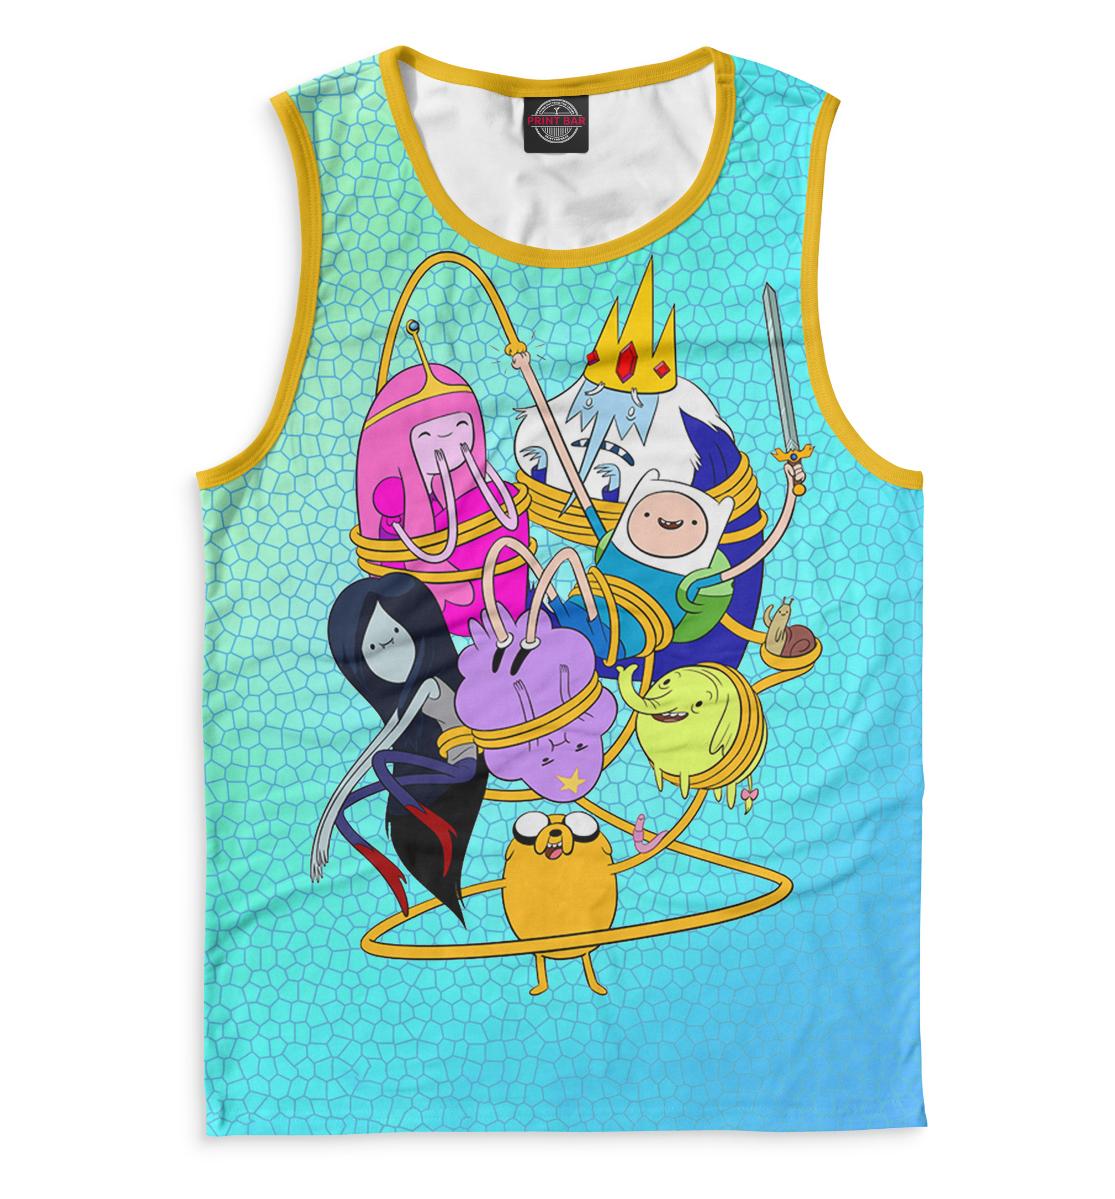 Купить Майка для мальчика Adventure Time ADV-721112-may-2